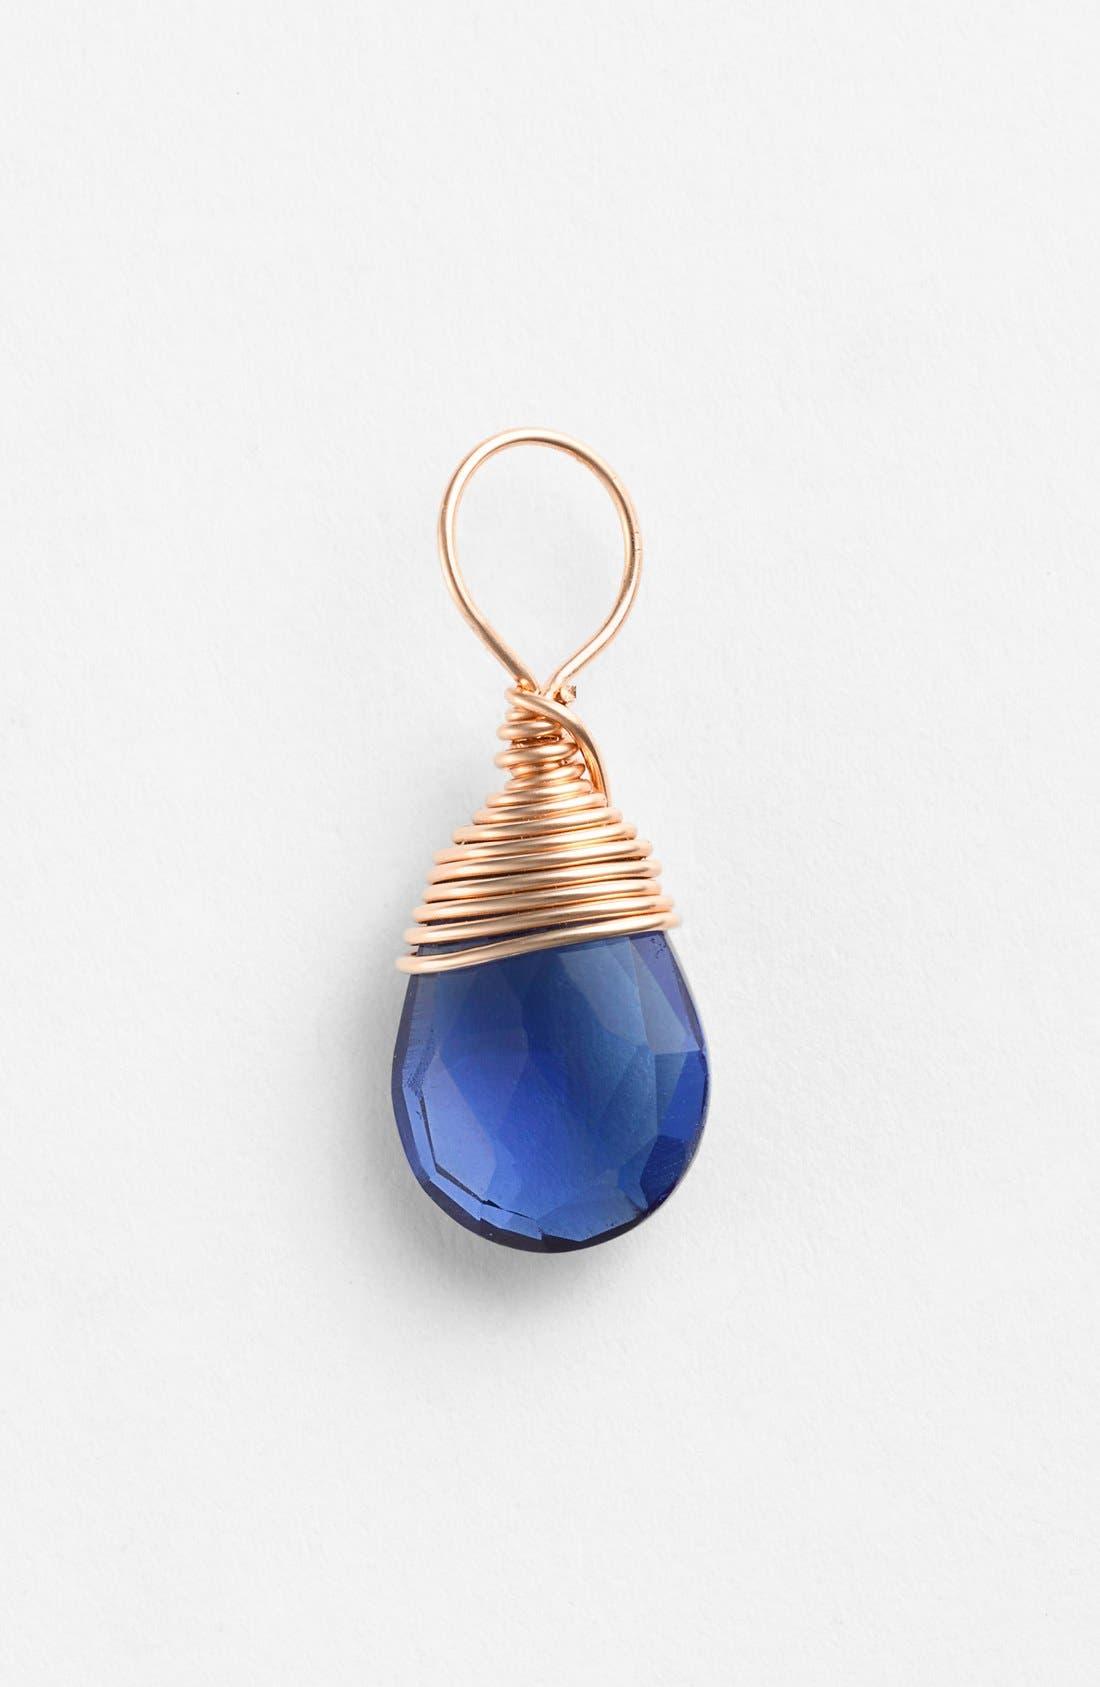 Nashelle 14k-Rose Gold Fill & Semiprecious Stone Charm